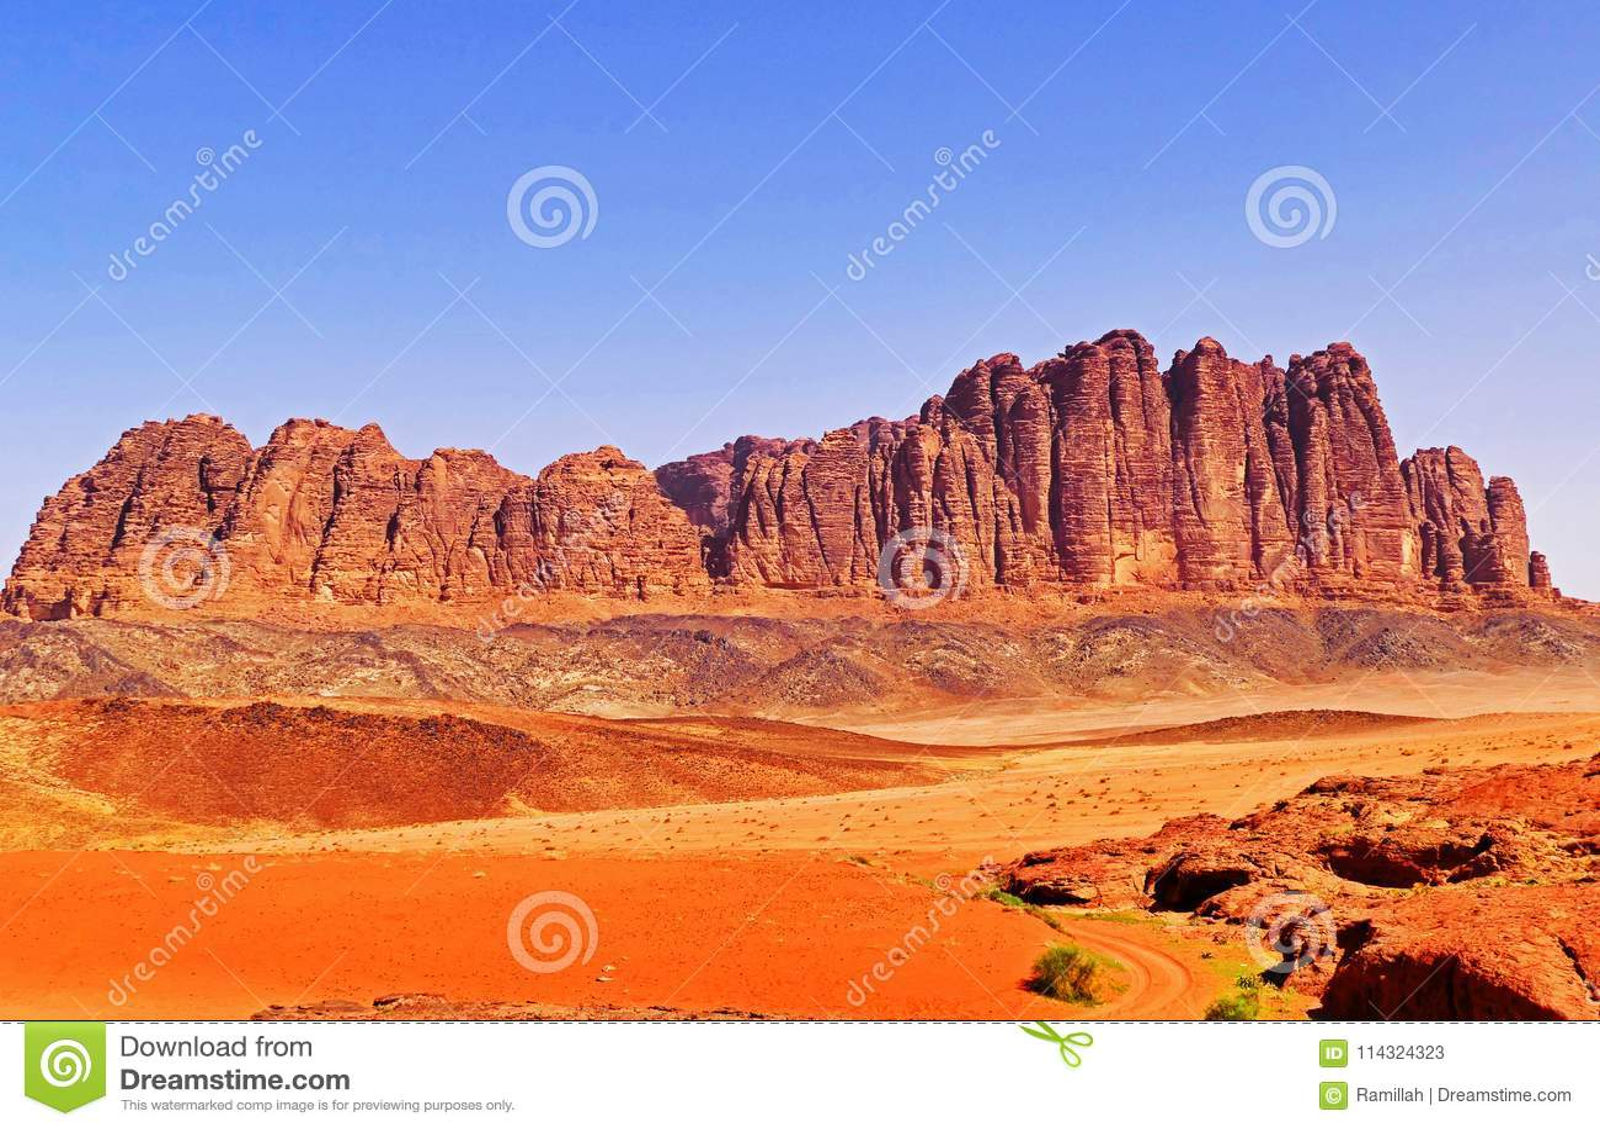 Paisaje escénico Rocky Mountain en Wadi Rum Desert, Jordania